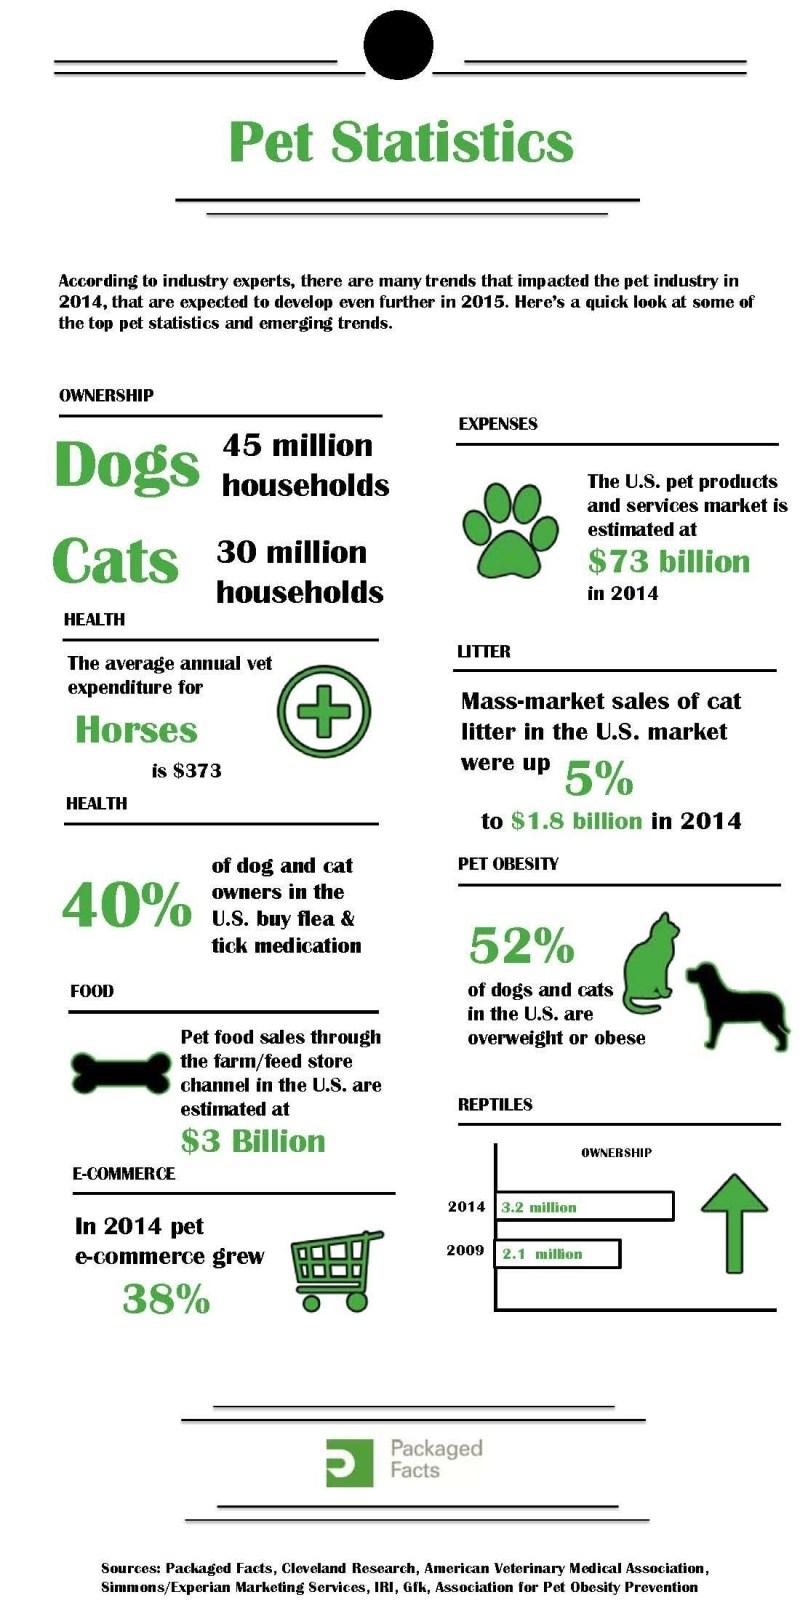 2014 US pet statistics infographic